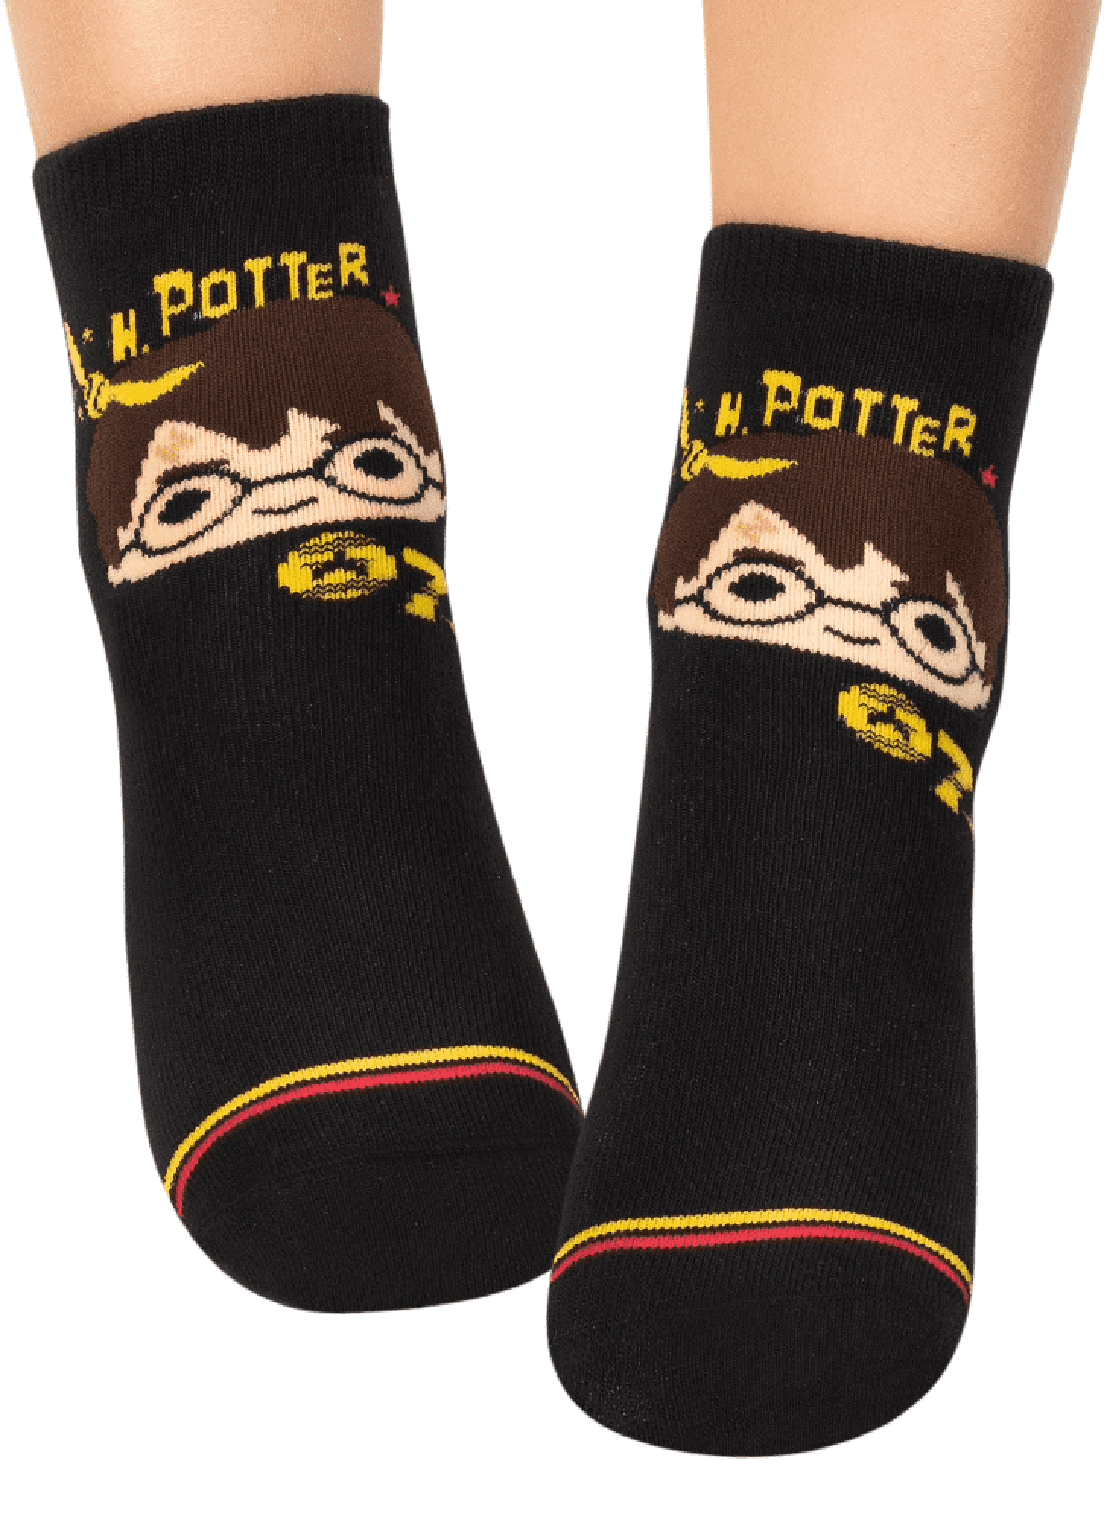 Meia Puket Soquete com sola emborrachada (Pansock) Harry Potter  Preta